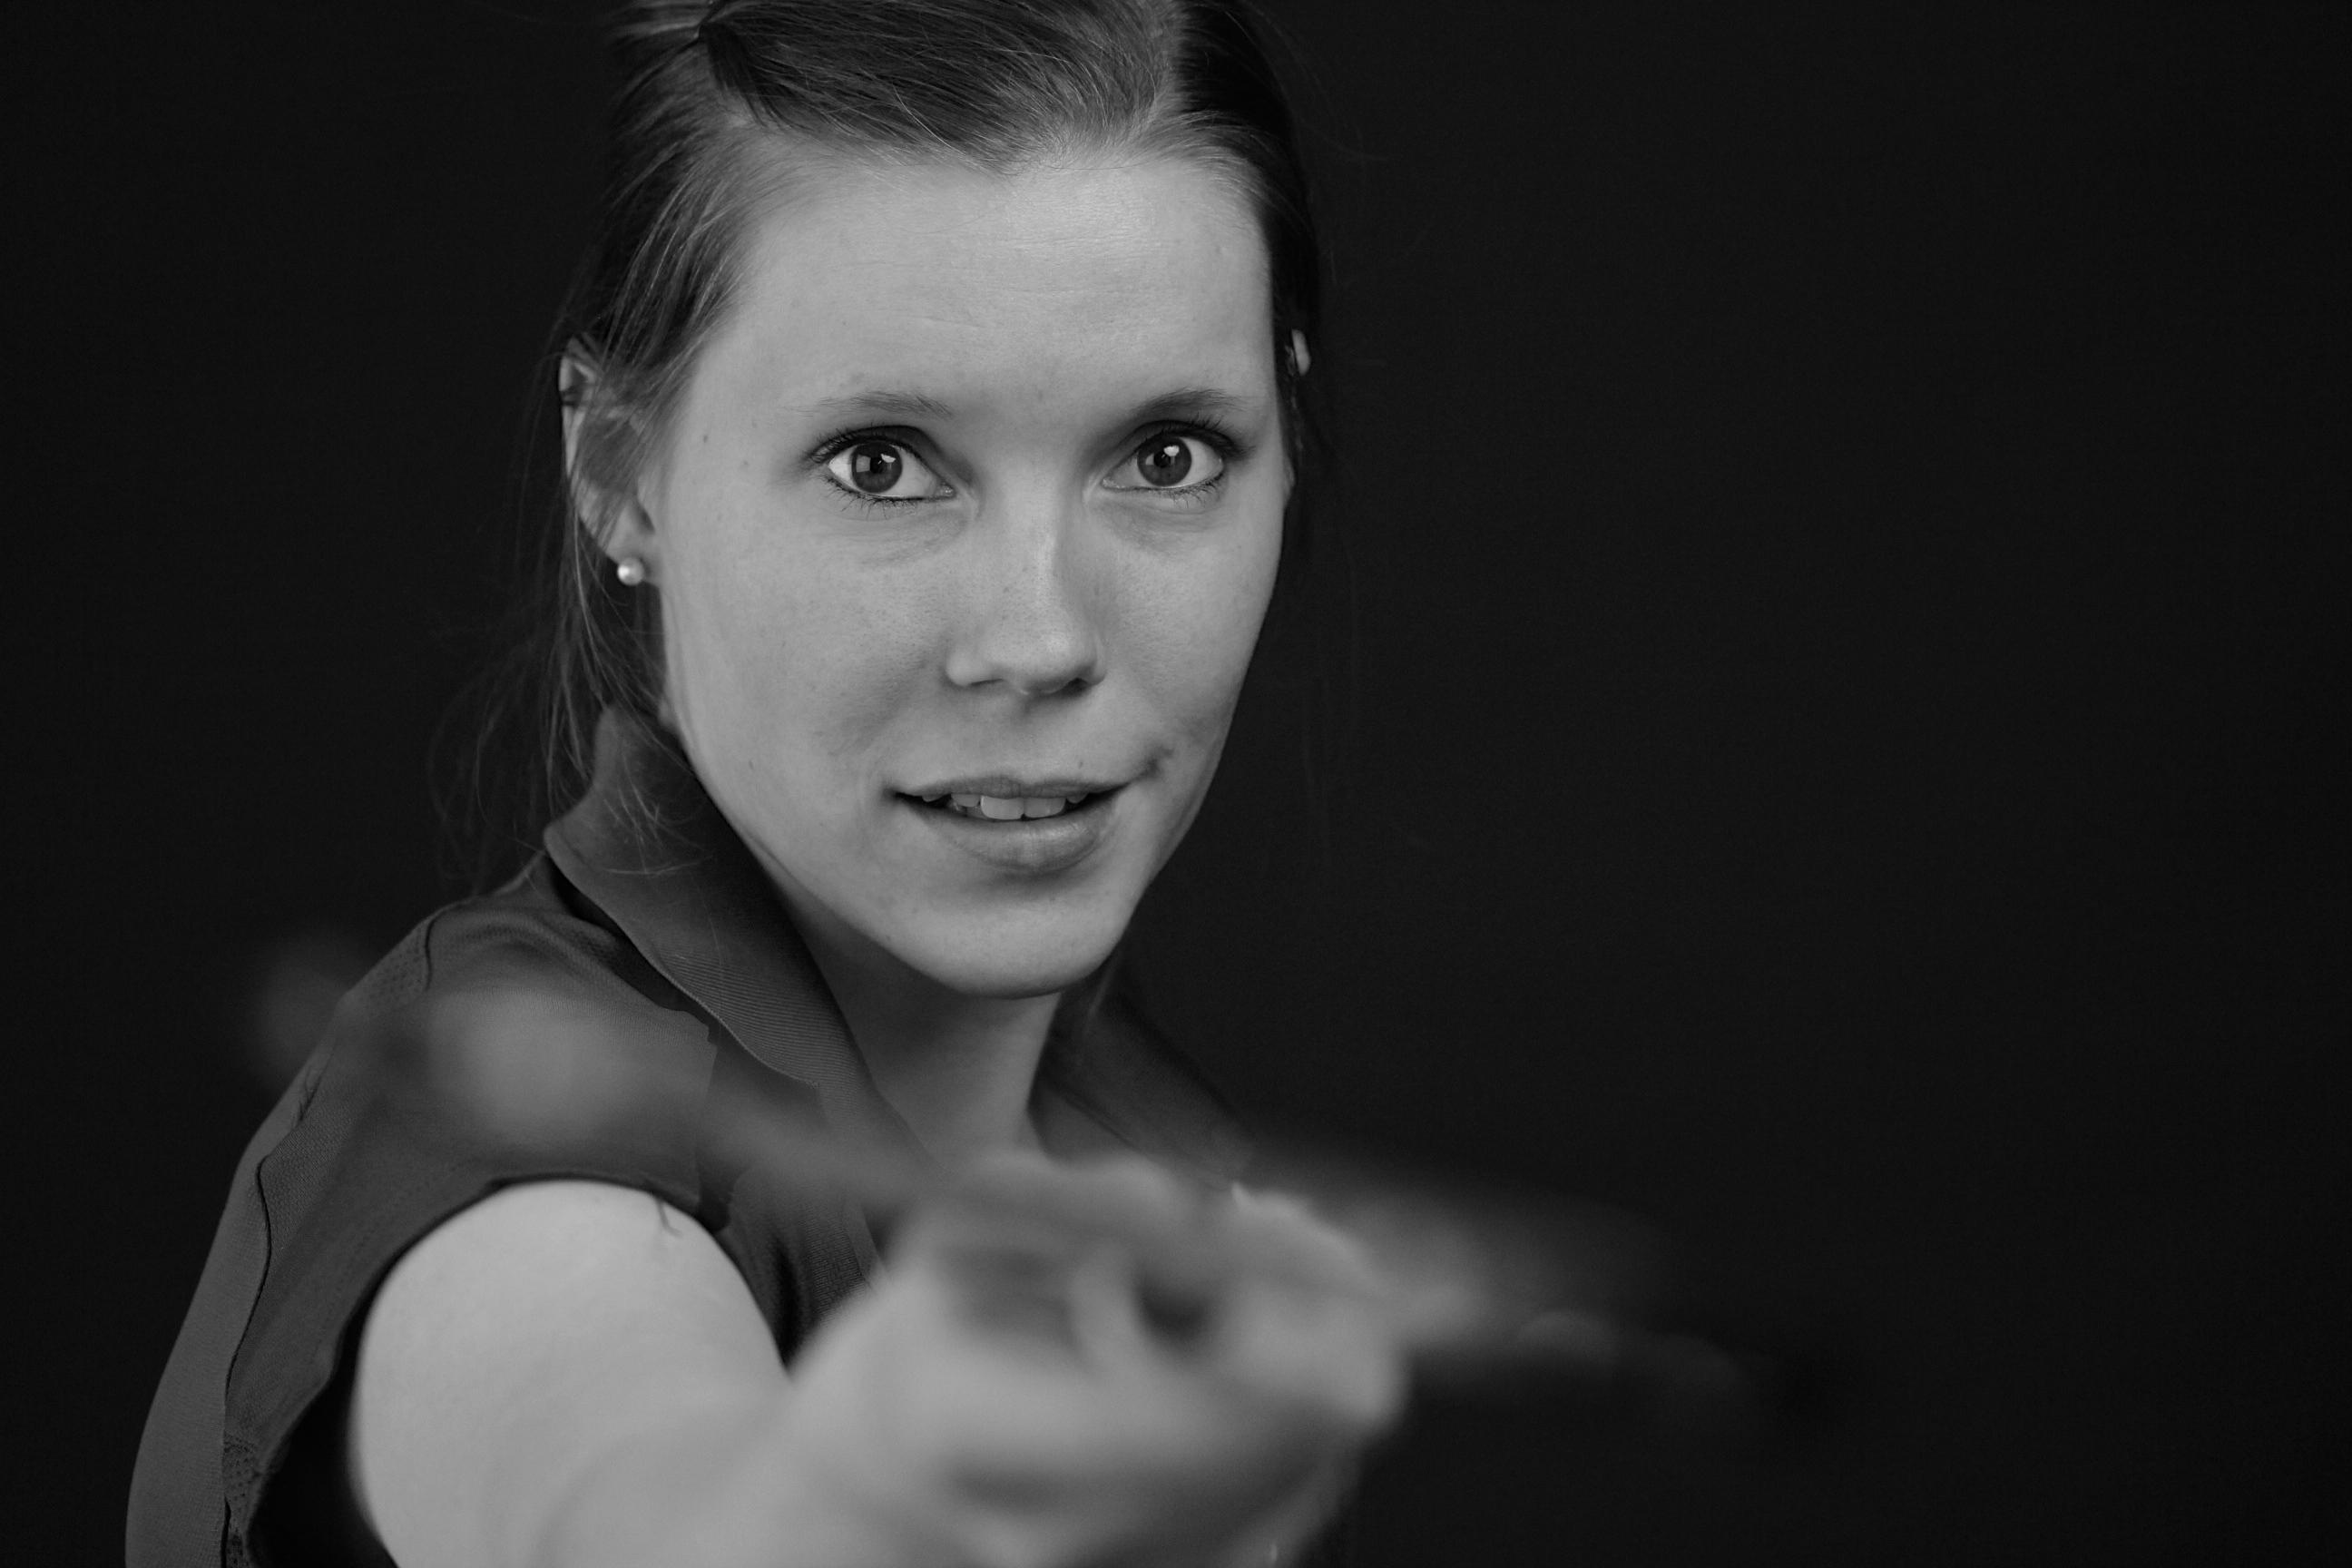 Astrid Ritter, 2013-5